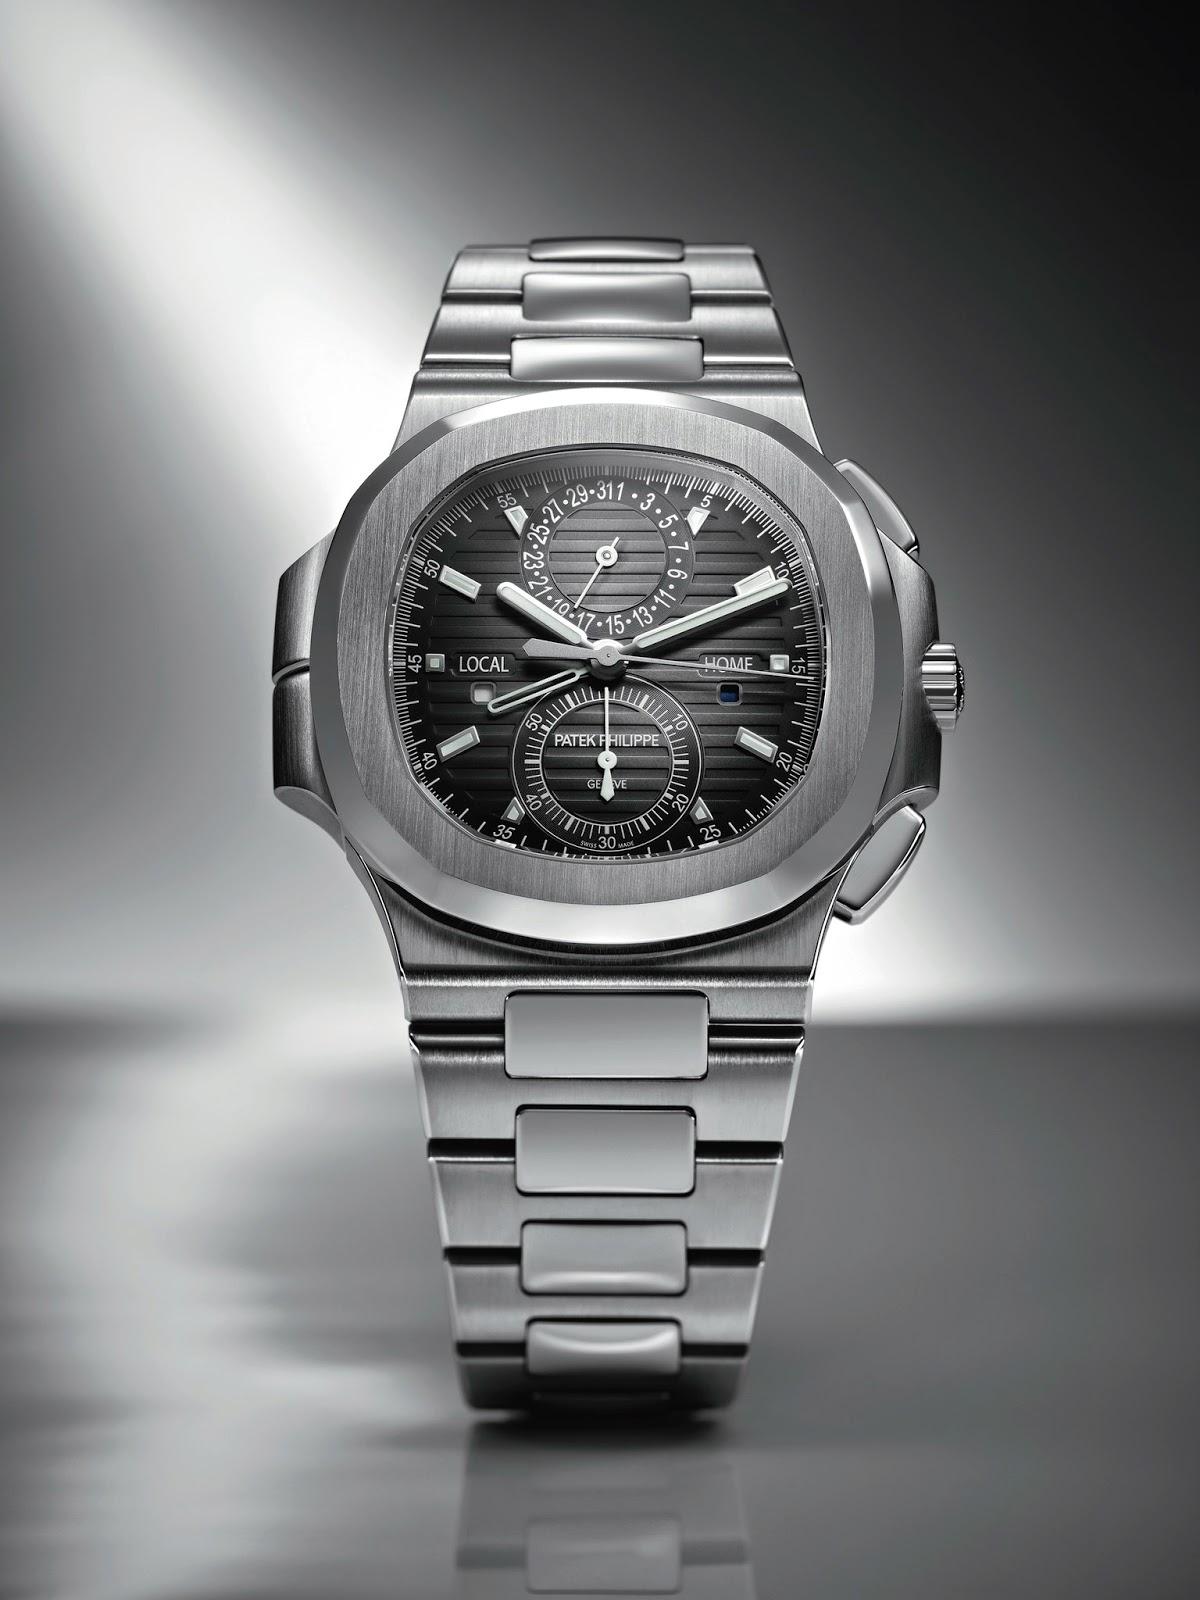 Patek Philippe Complications Chronograph Men's Watch 5170R ...  Patek Watch